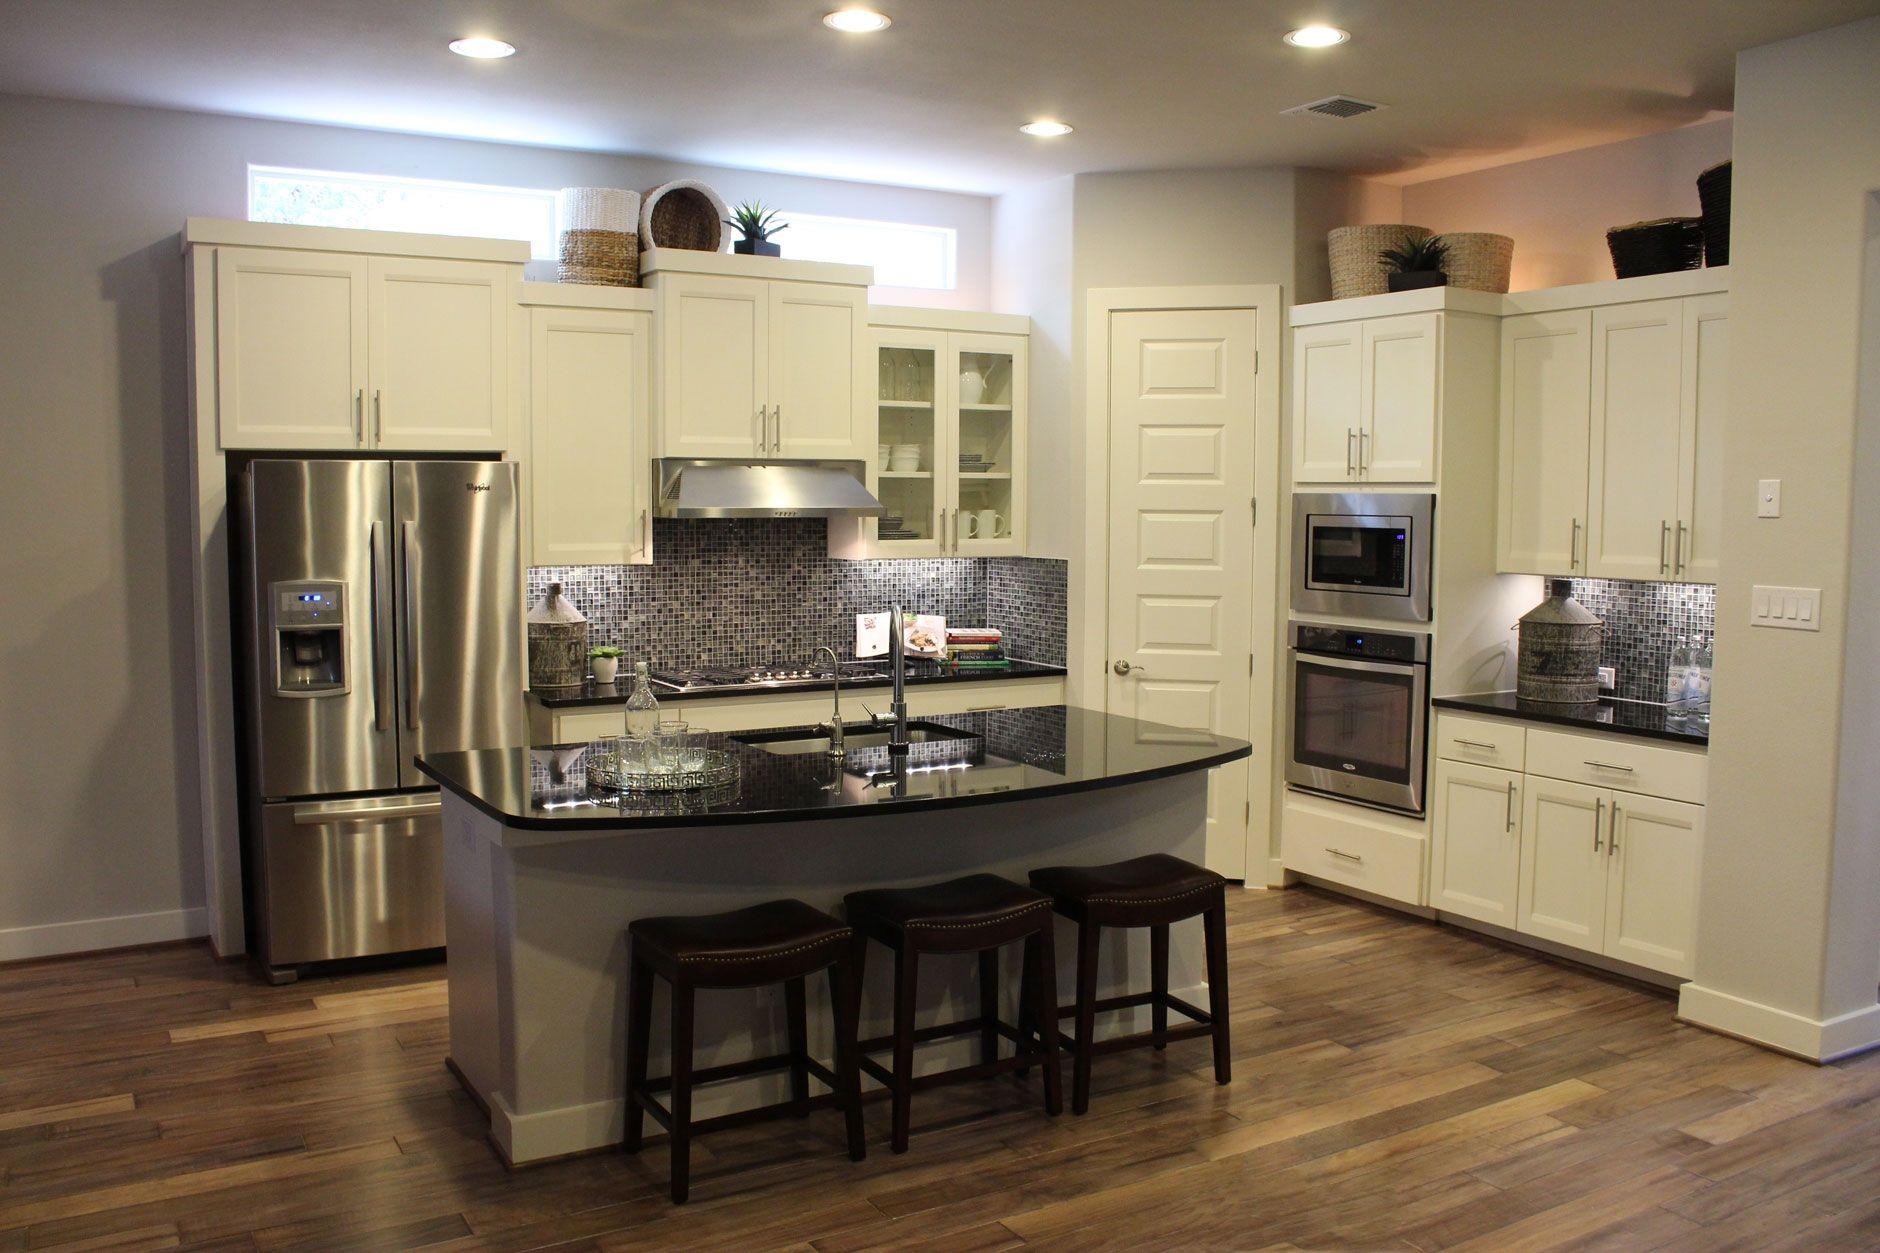 Kitchen Cabinet Countertop Color Combinations  Httpnavigator Enchanting Kitchen Cabinets Color Combination Design Ideas